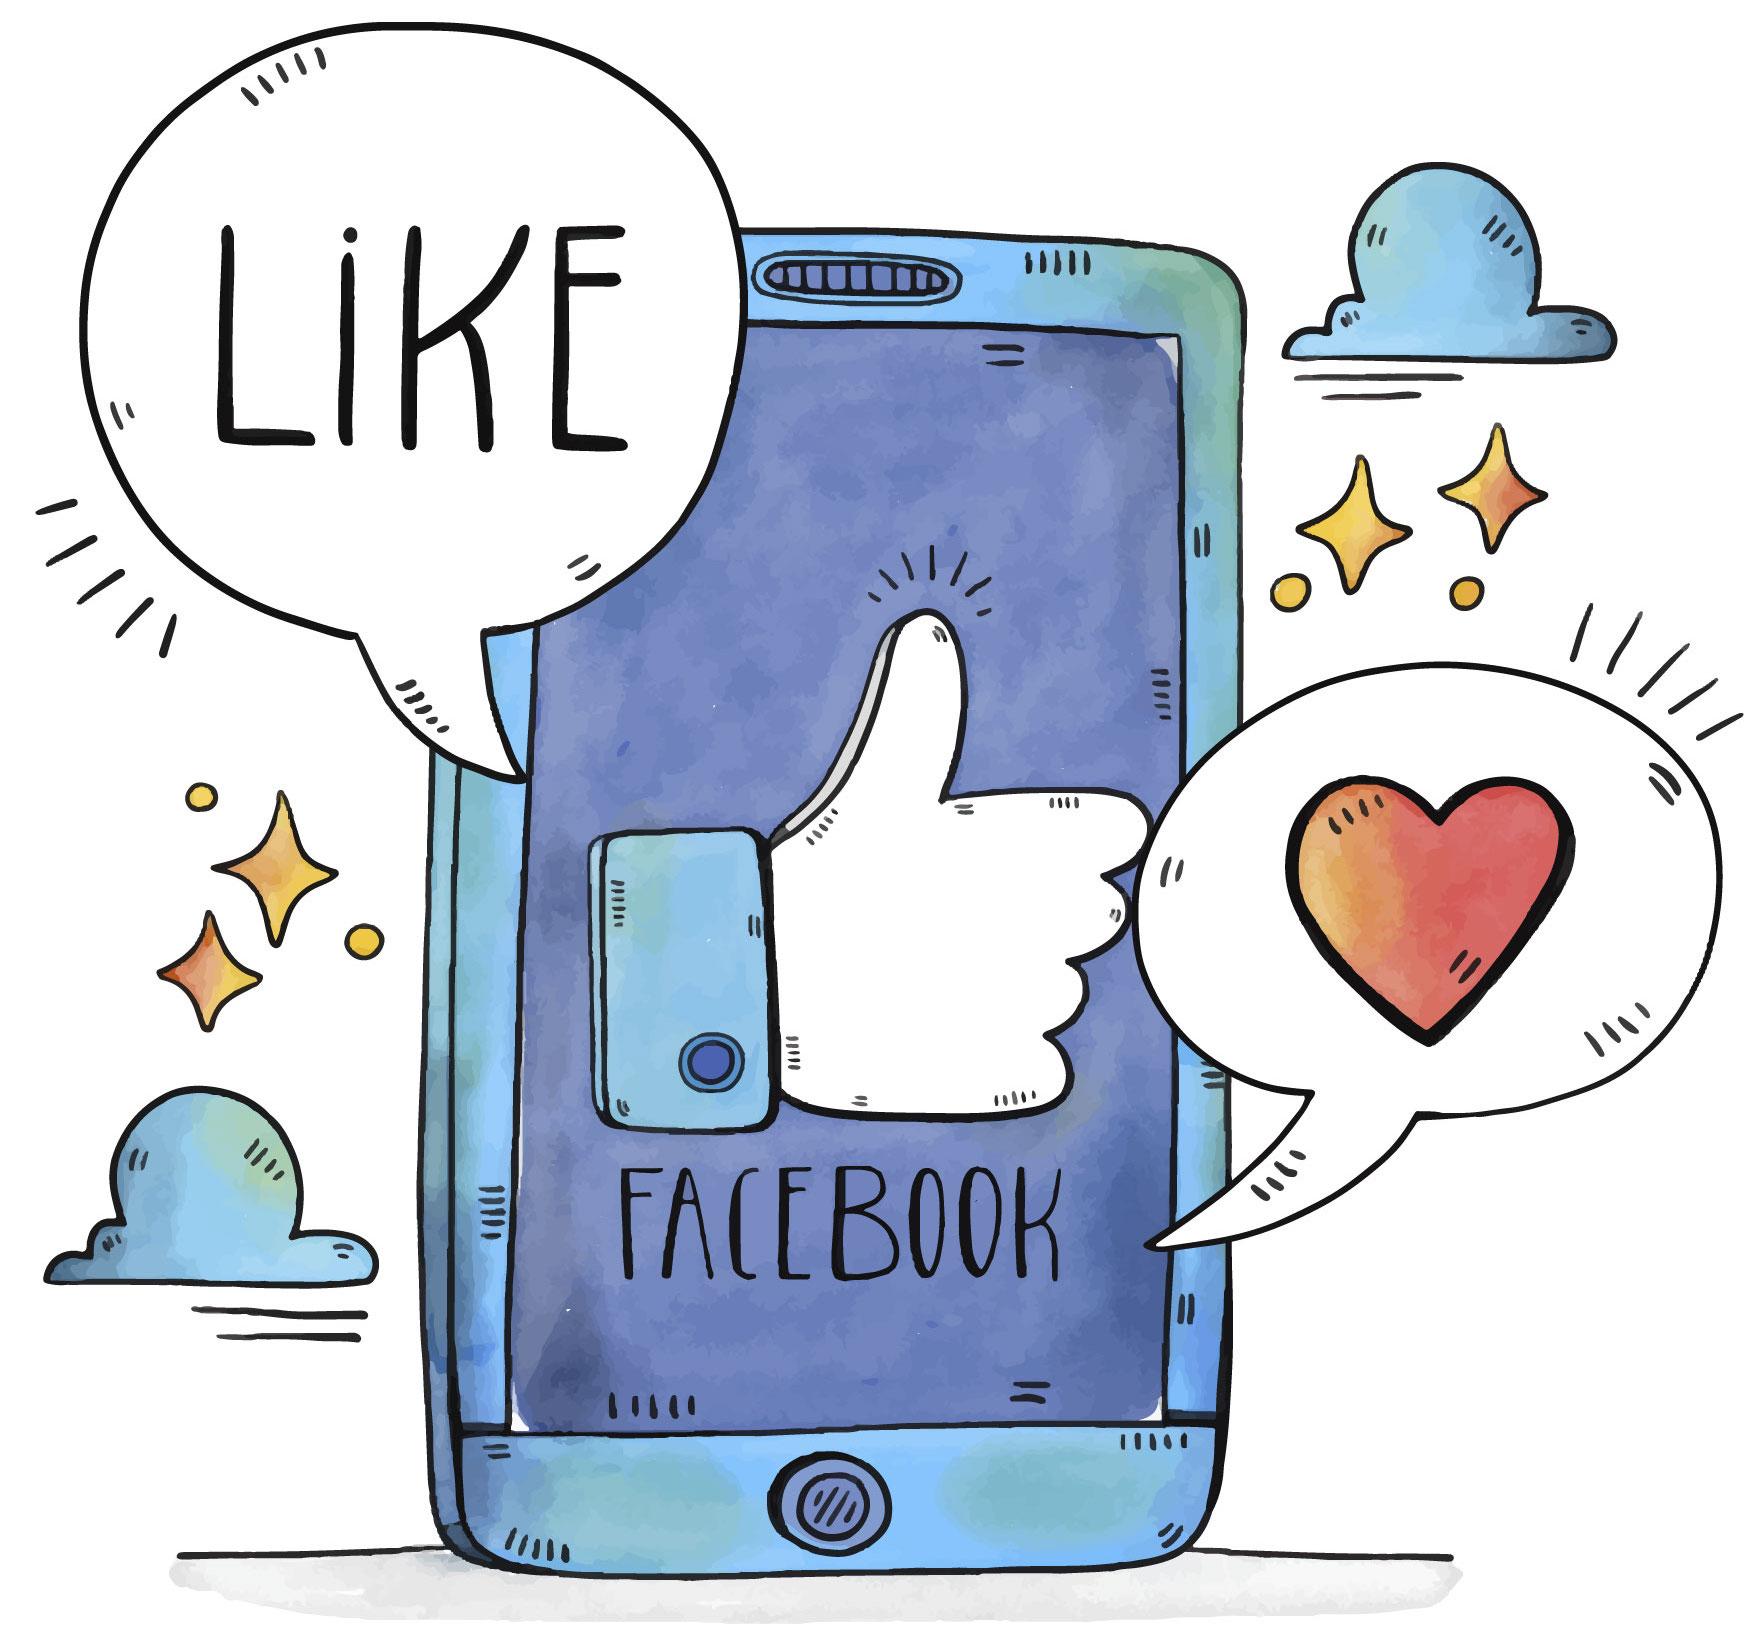 offline facebook.jpg